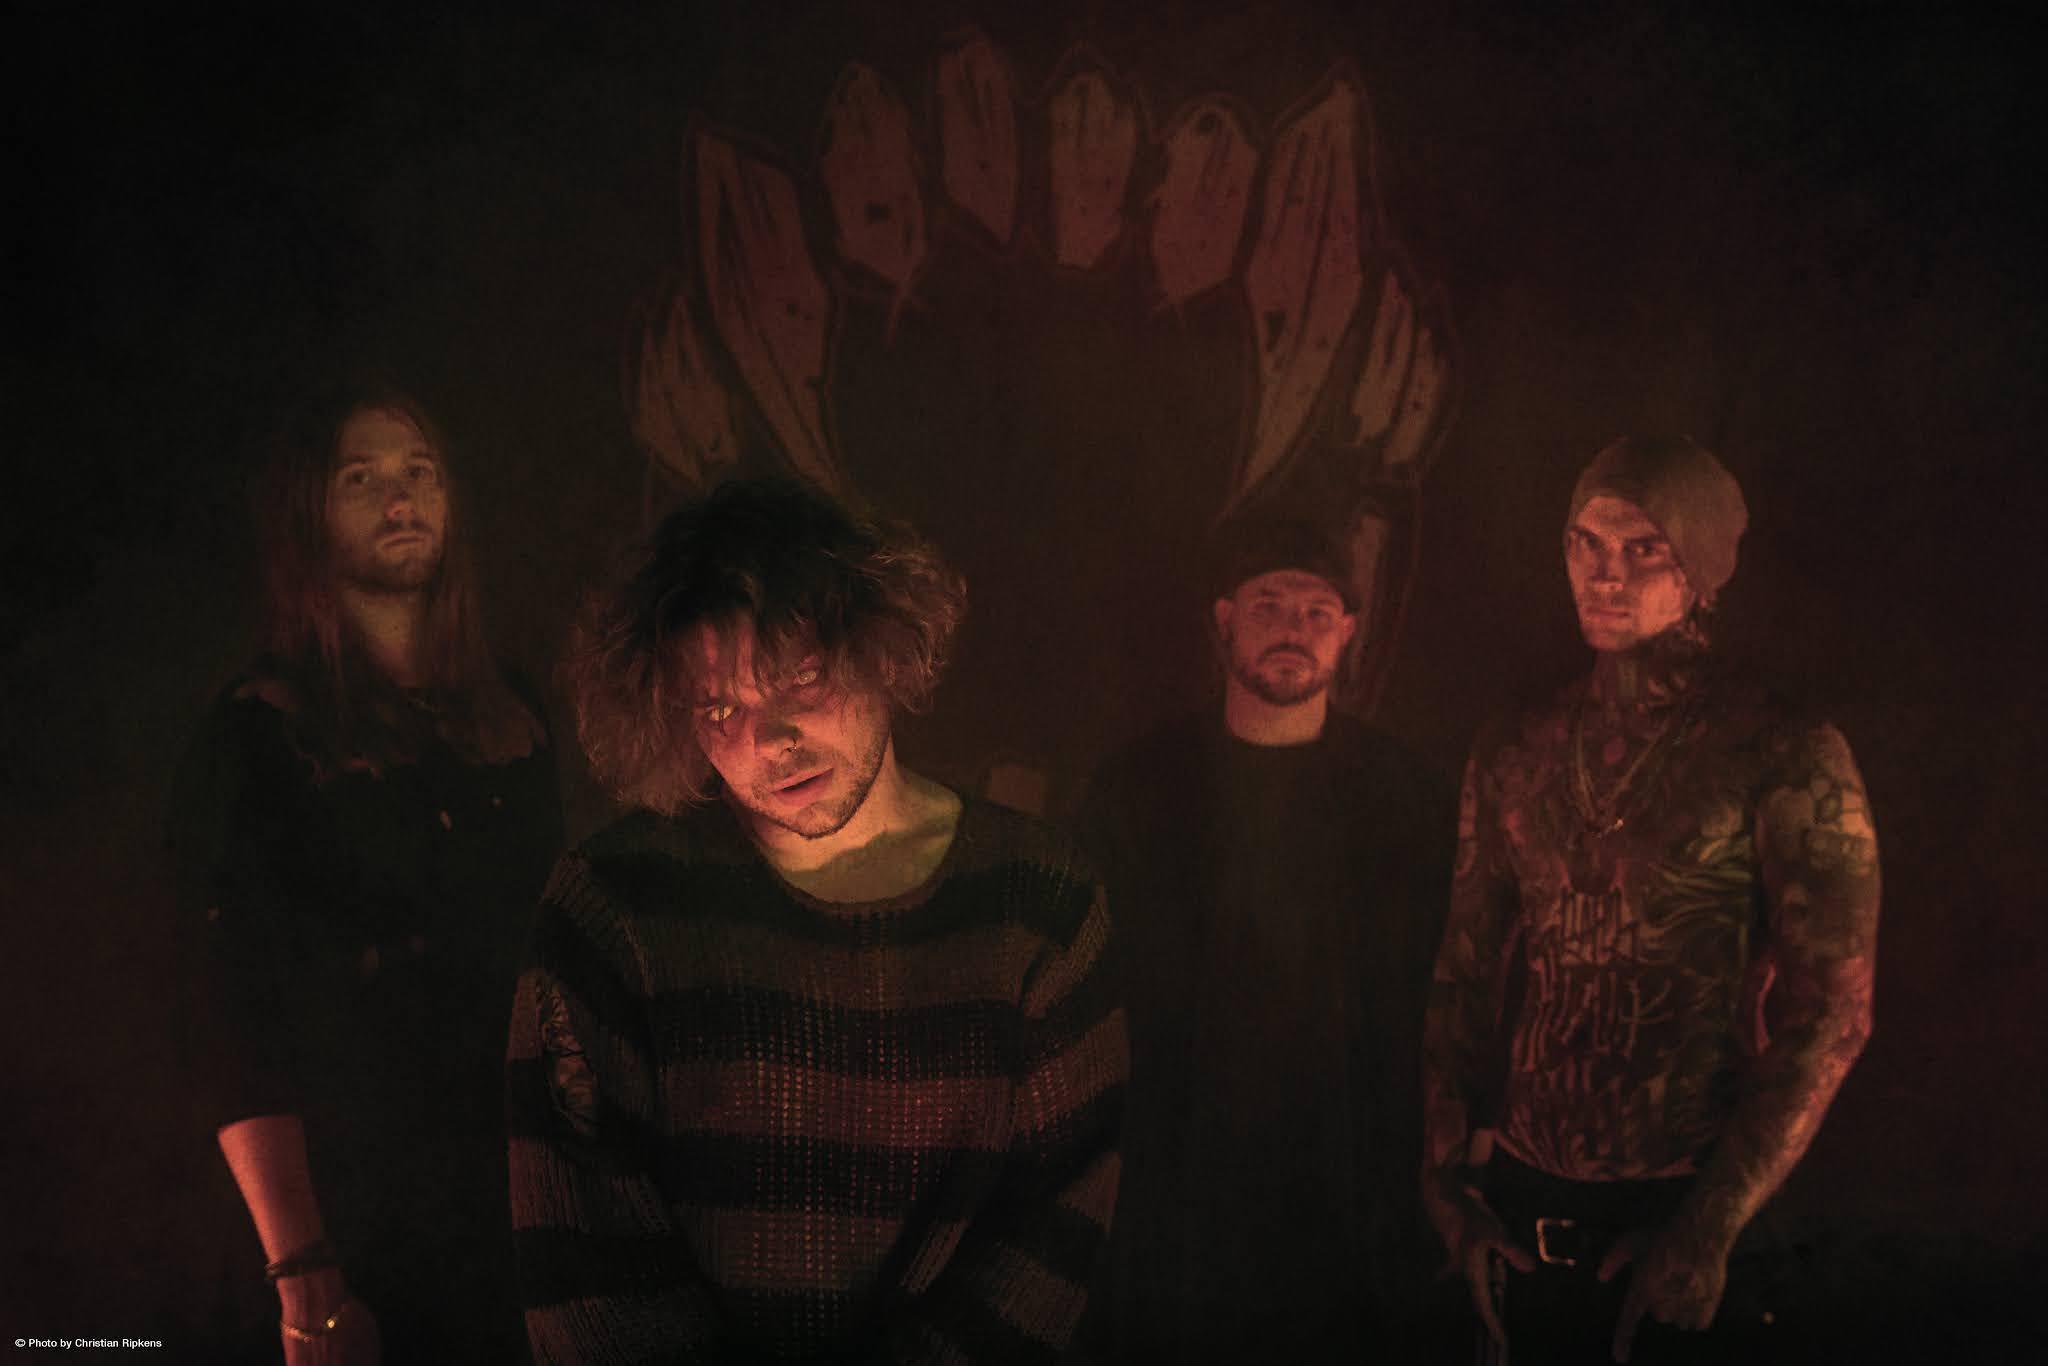 Ghostkid photo band